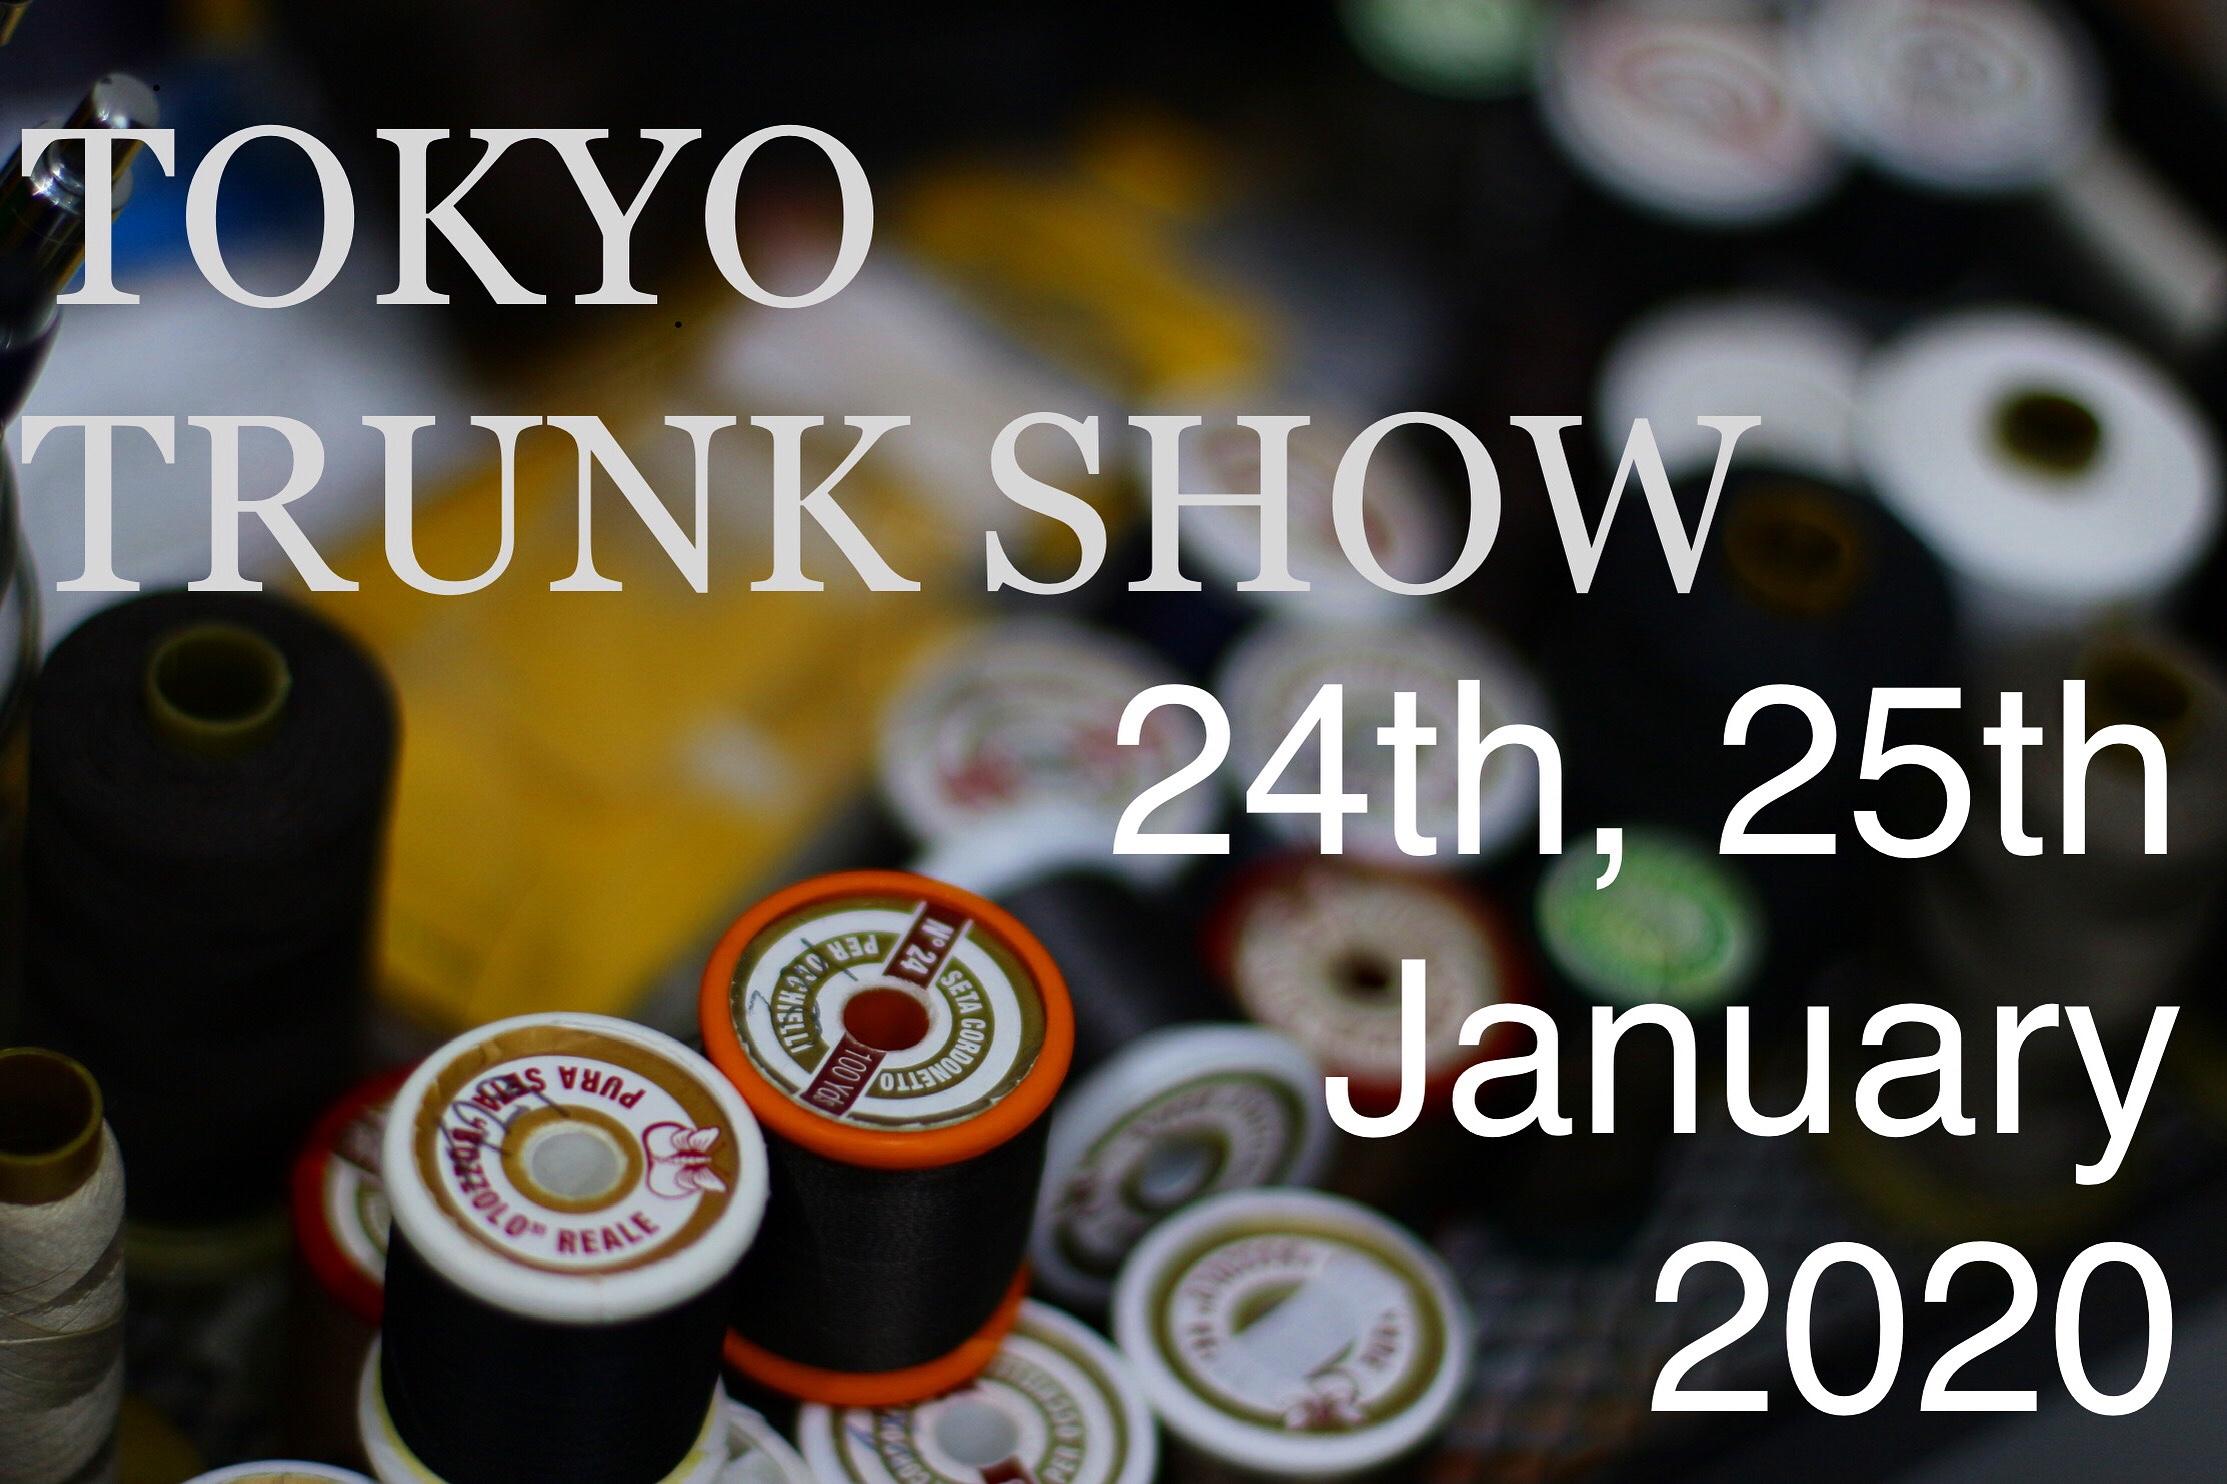 TOKYO TRUNK SHOW